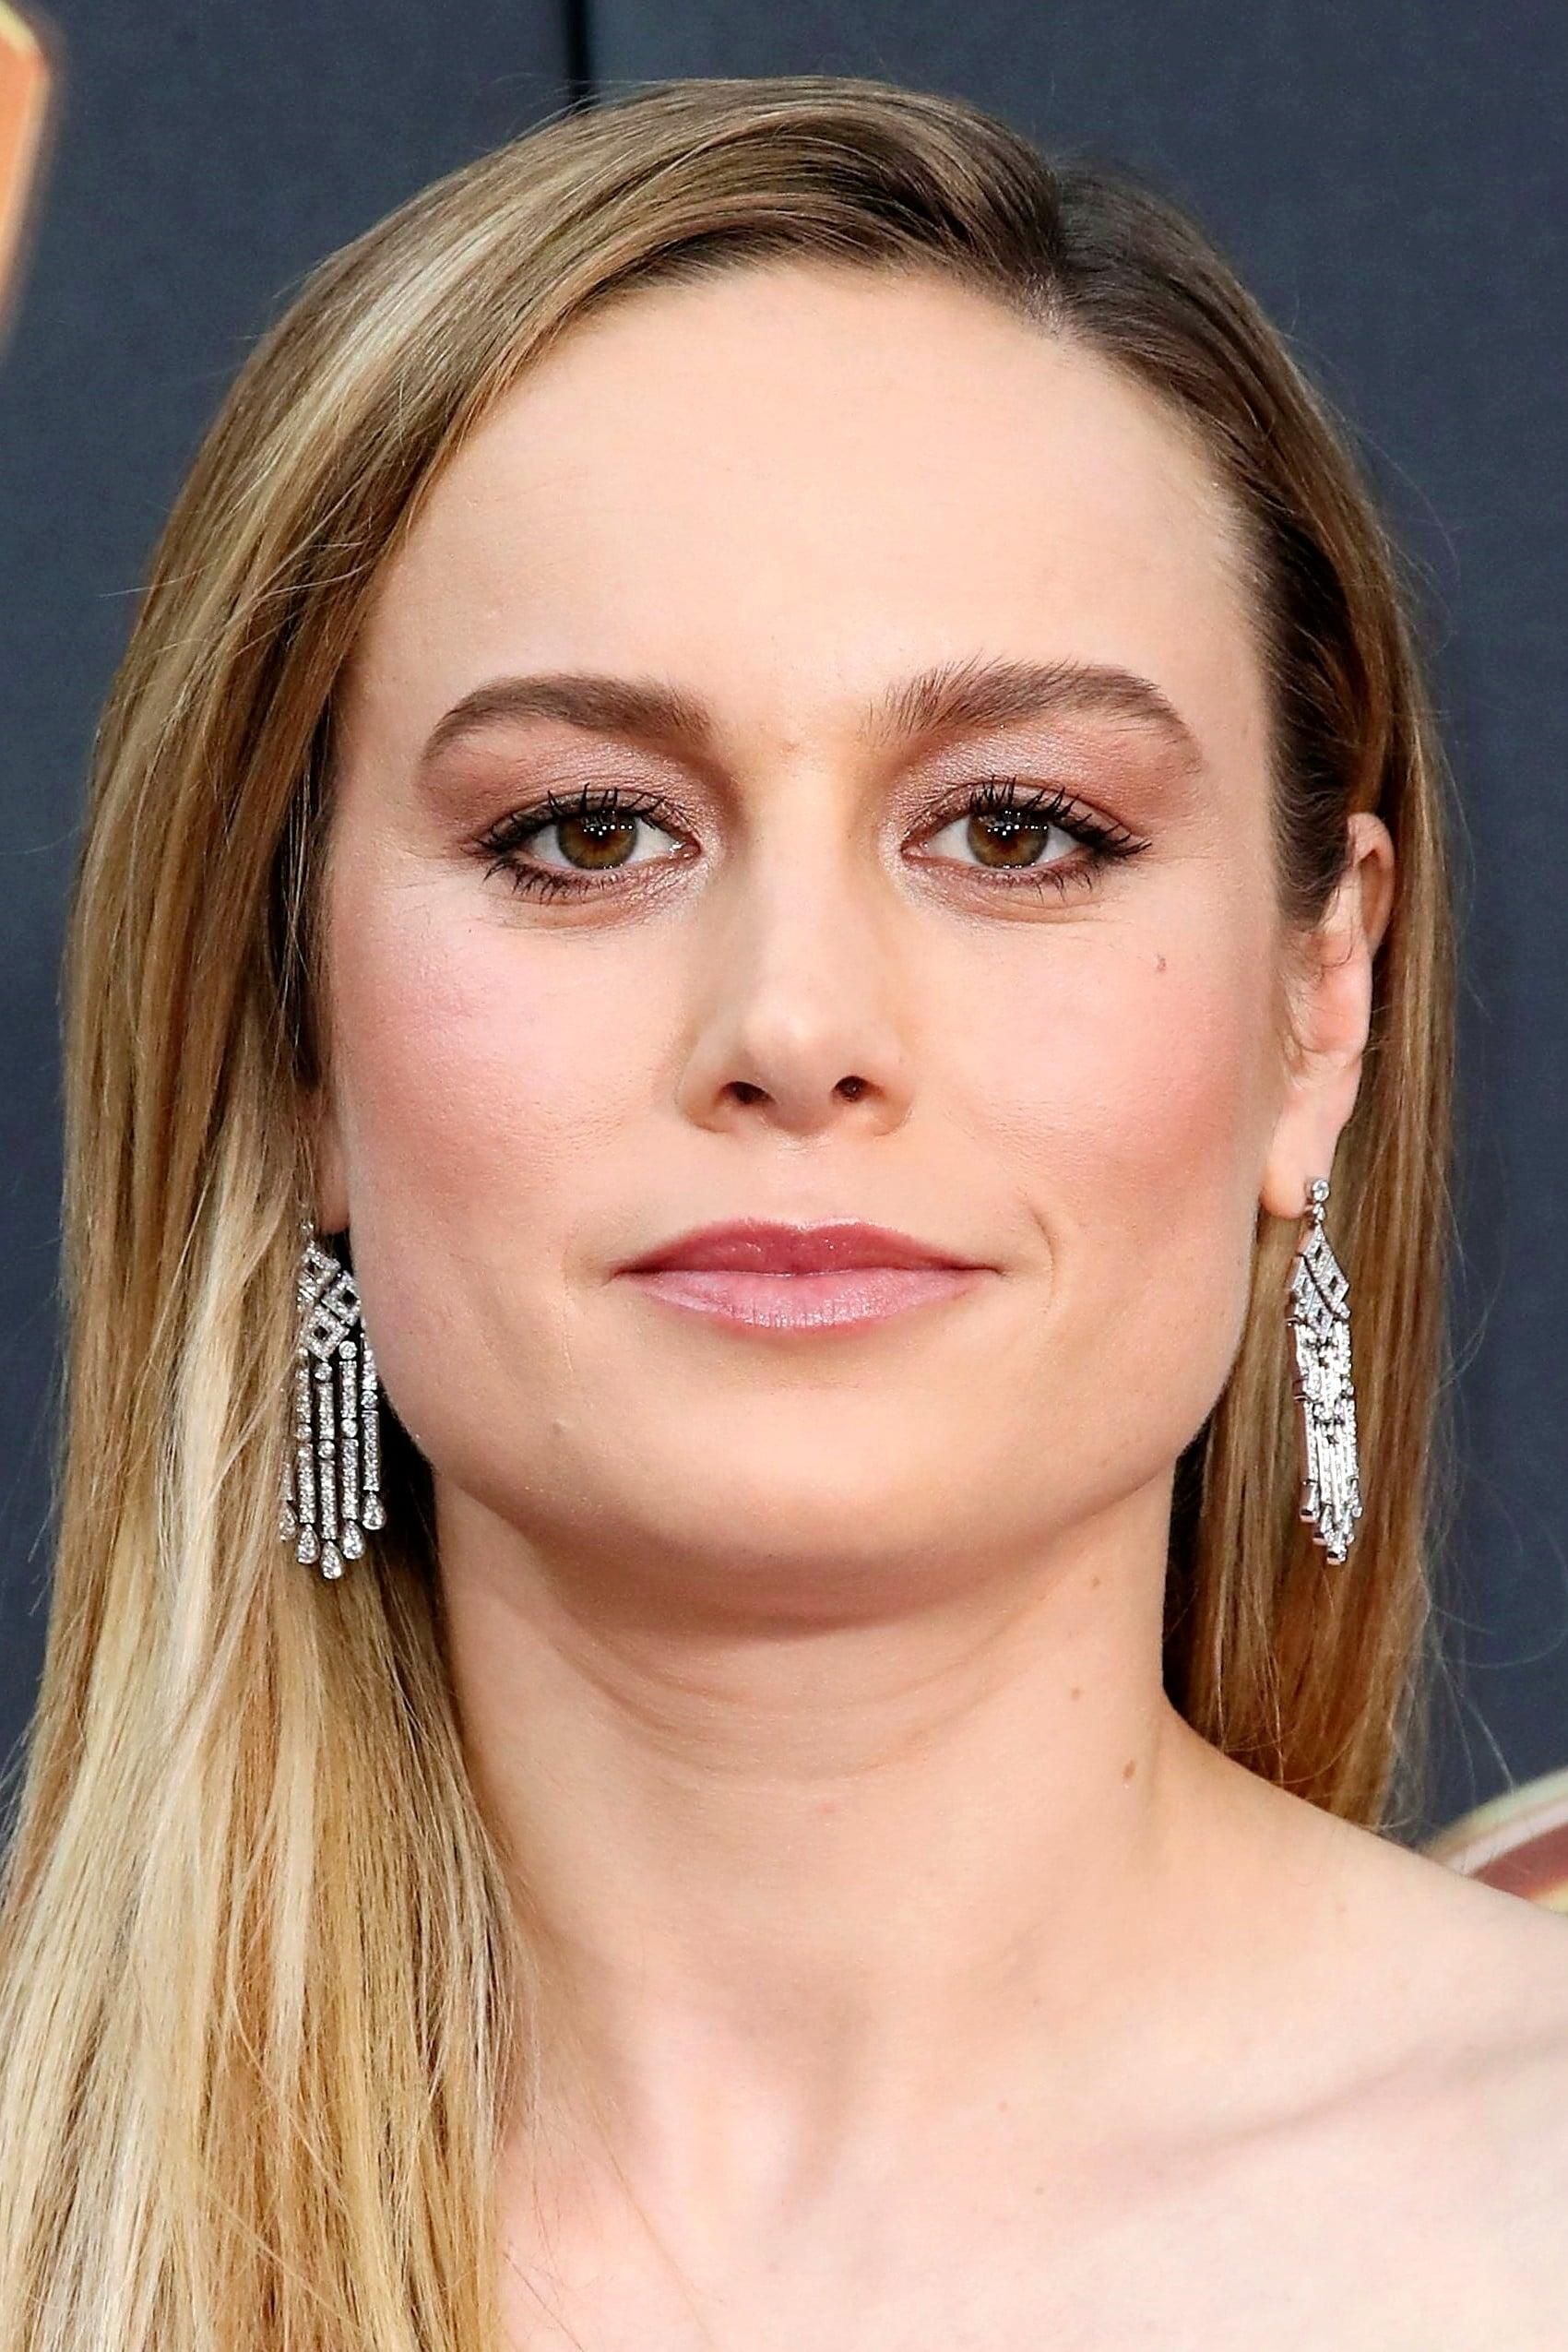 Brie Larson isCarol Danvers / Captain Marvel